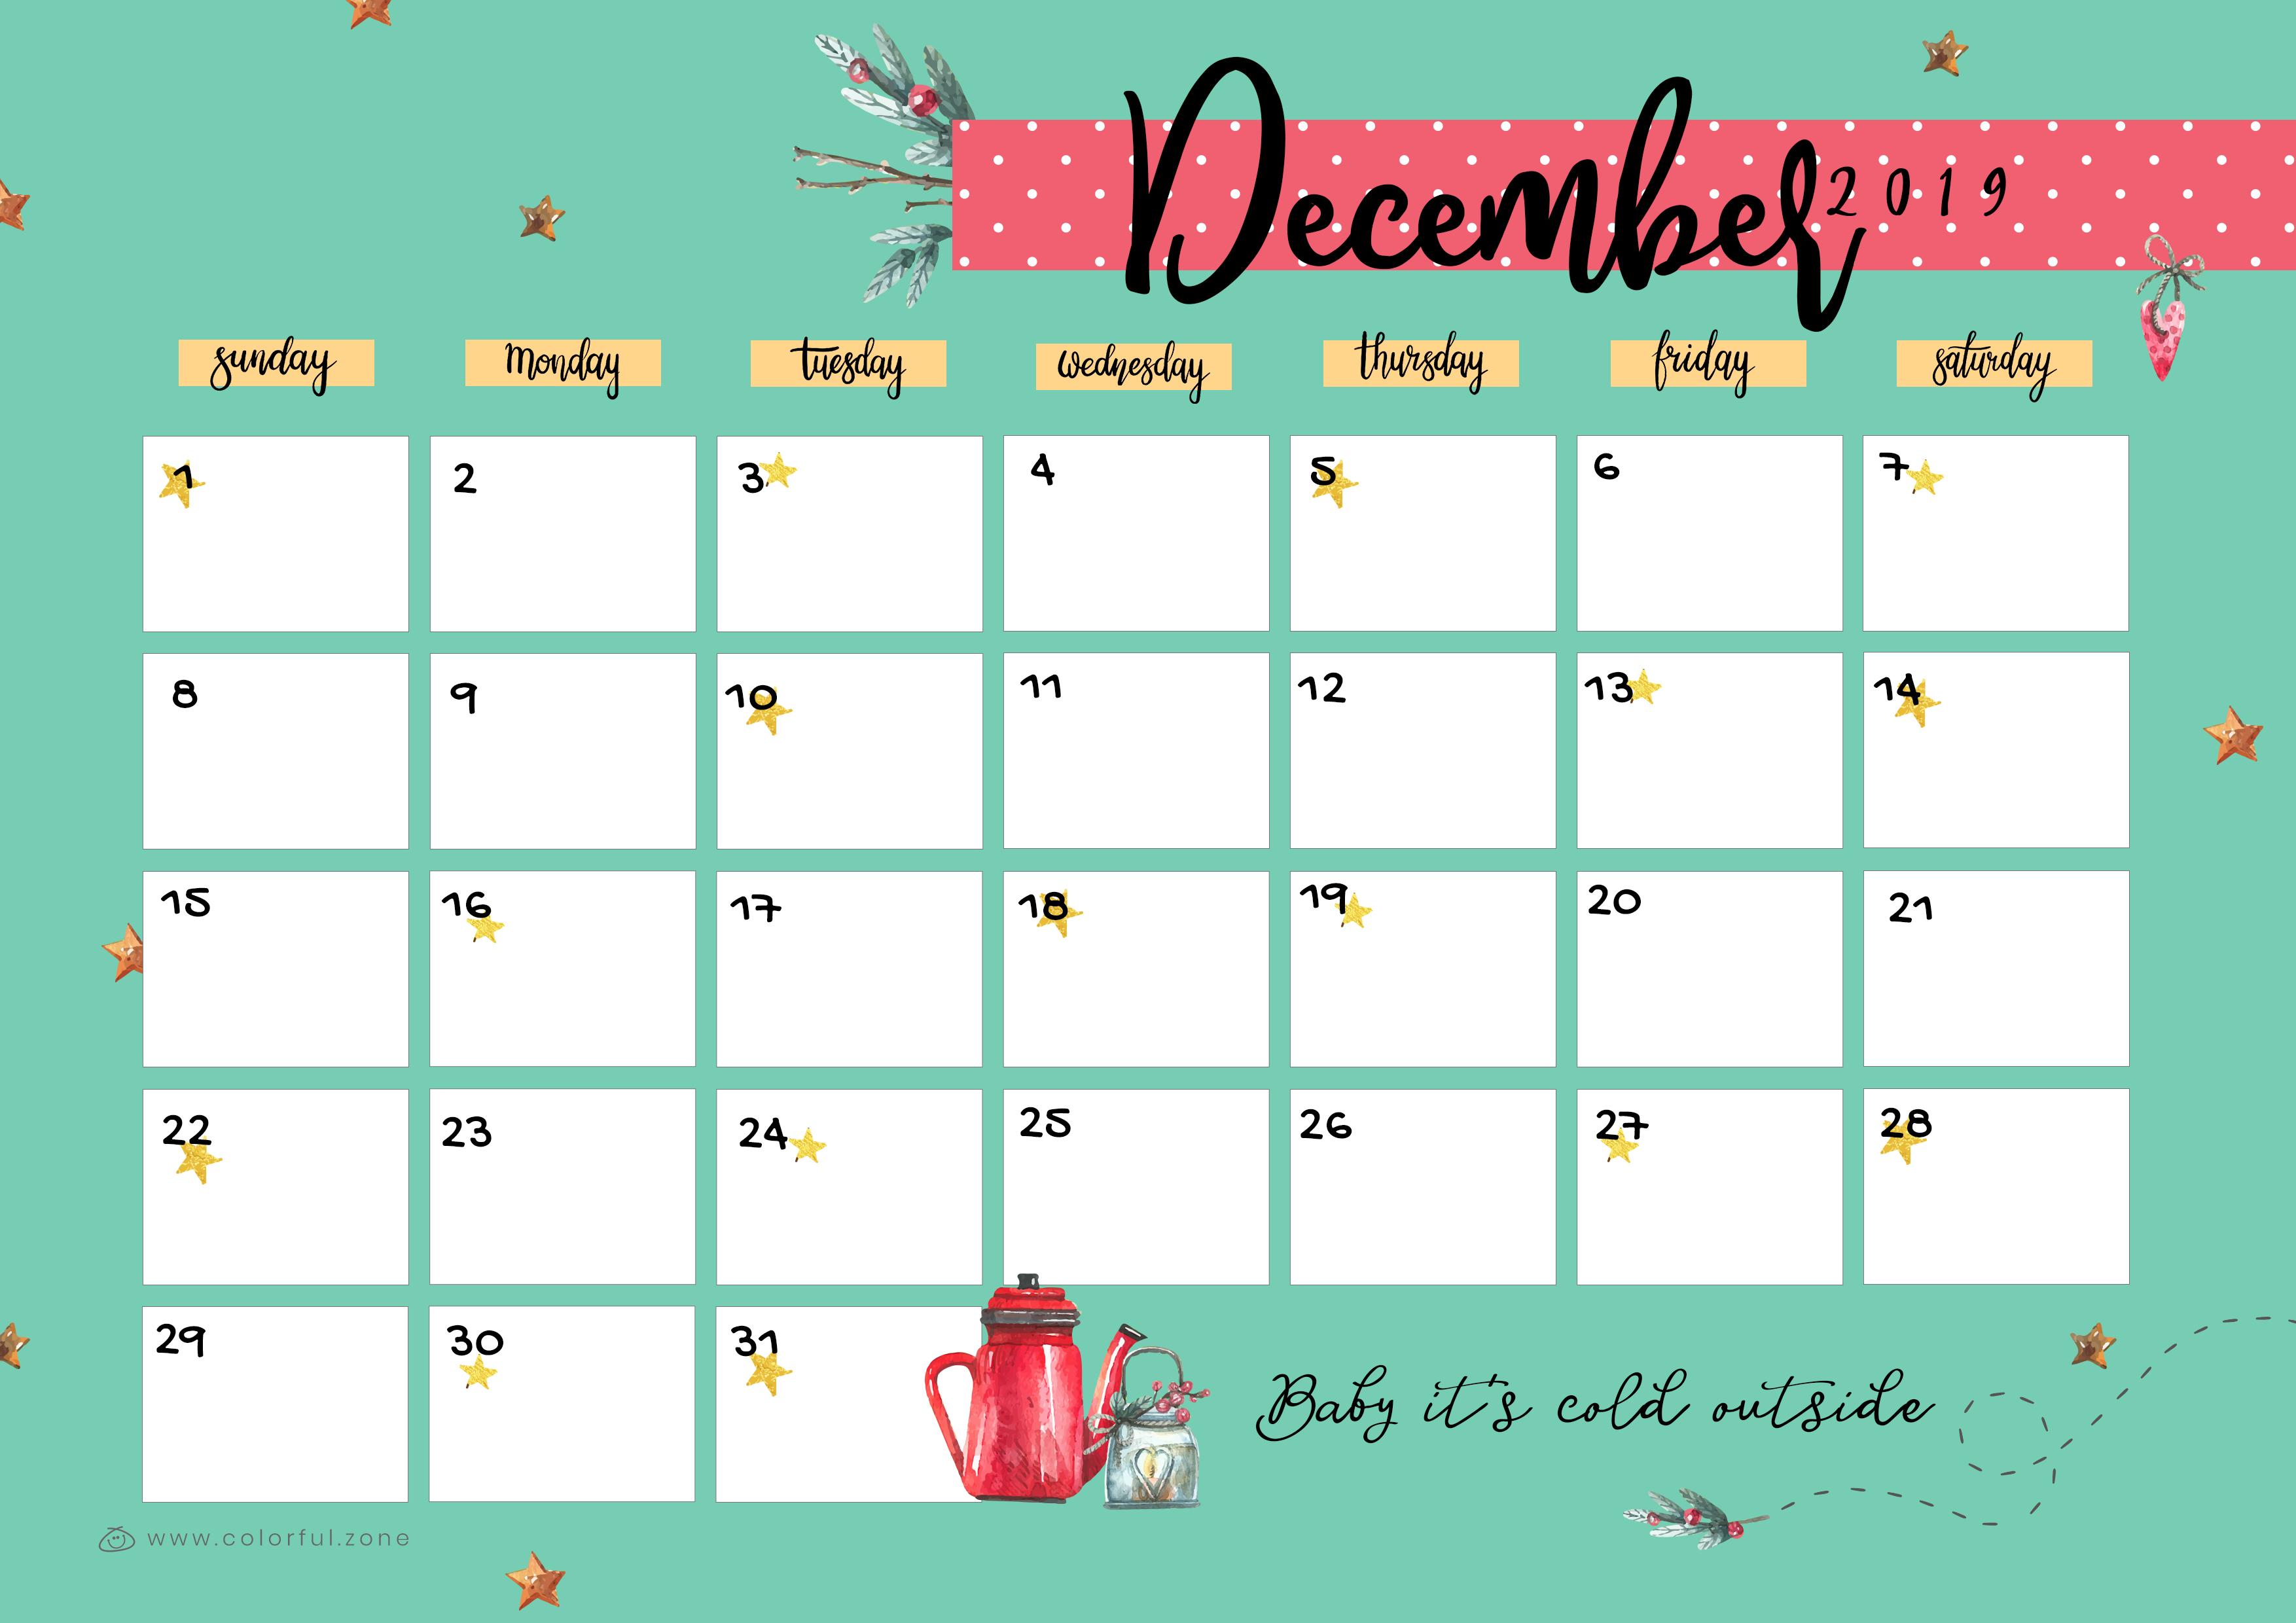 December Printable Colorful Calendar 2019